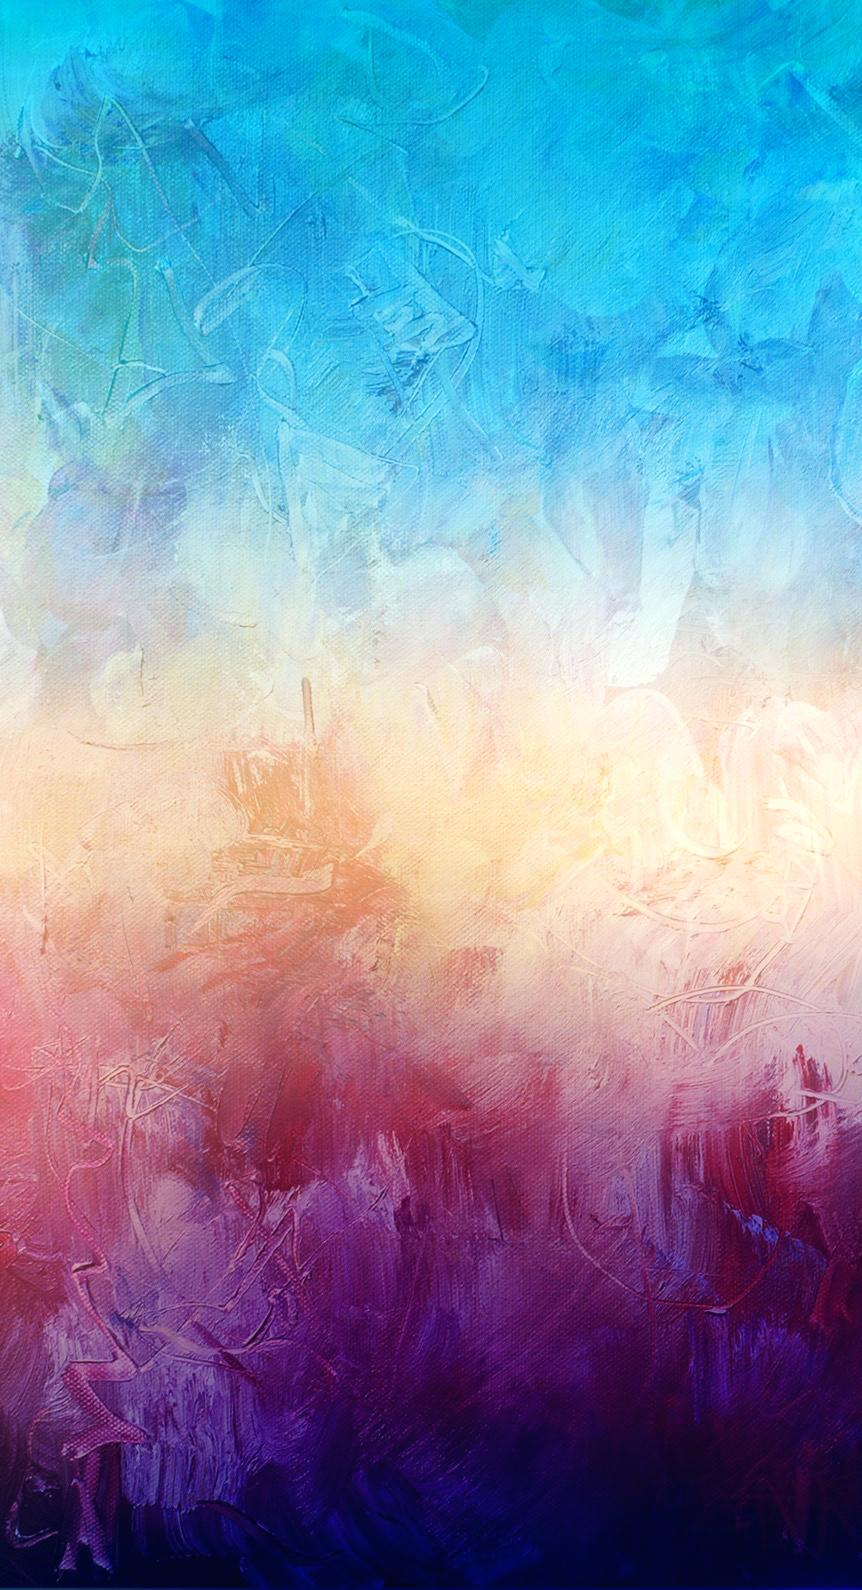 862x1590 Watercolor Wallpaper Iphone 6 Plus Art Oil Paint Wallpaper